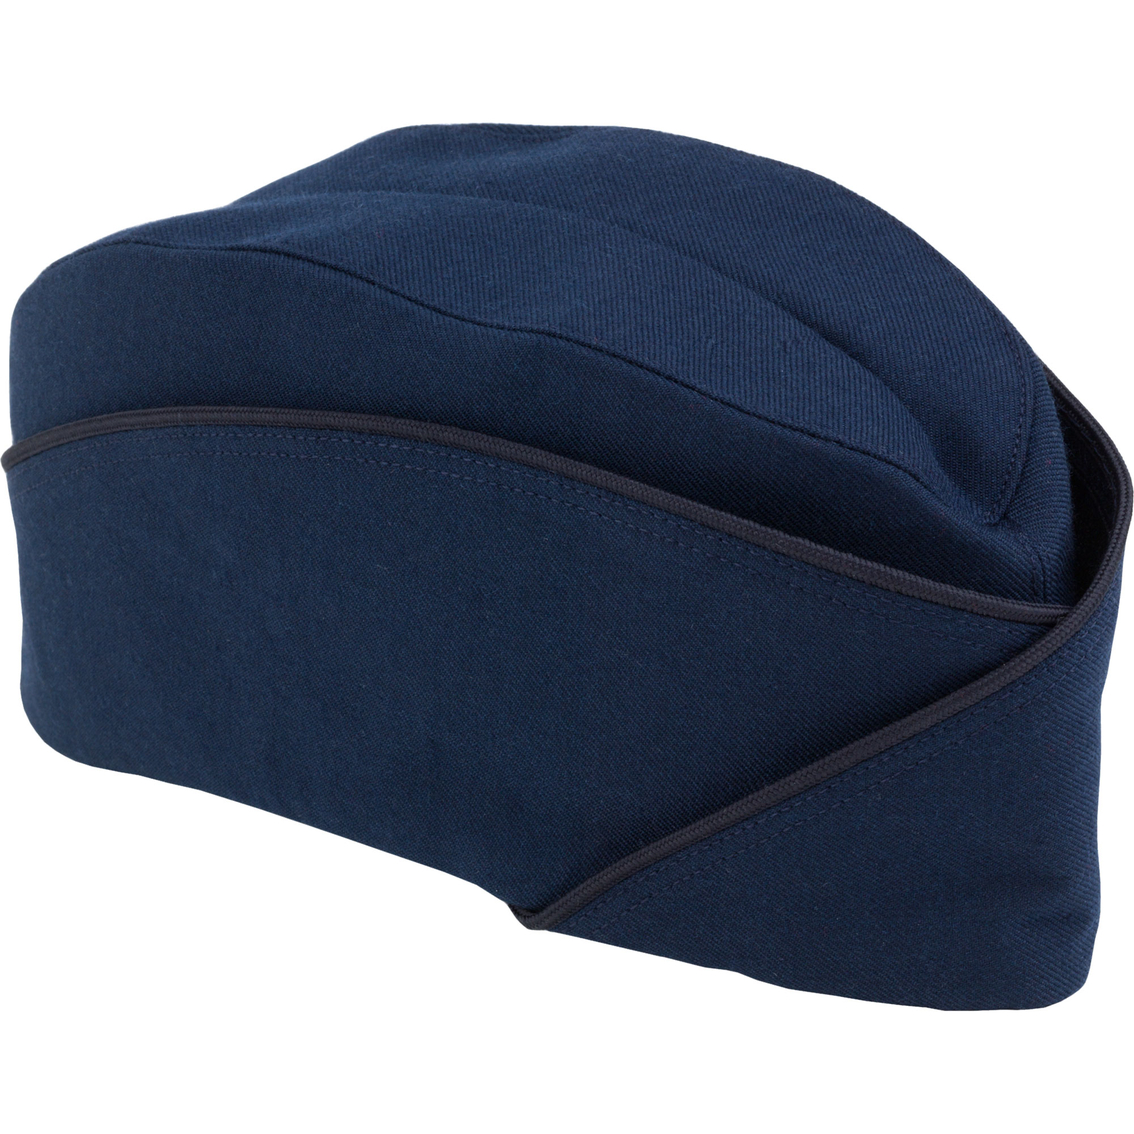 Dlats Air Force Women S Enlisted Flight Cap Headgear